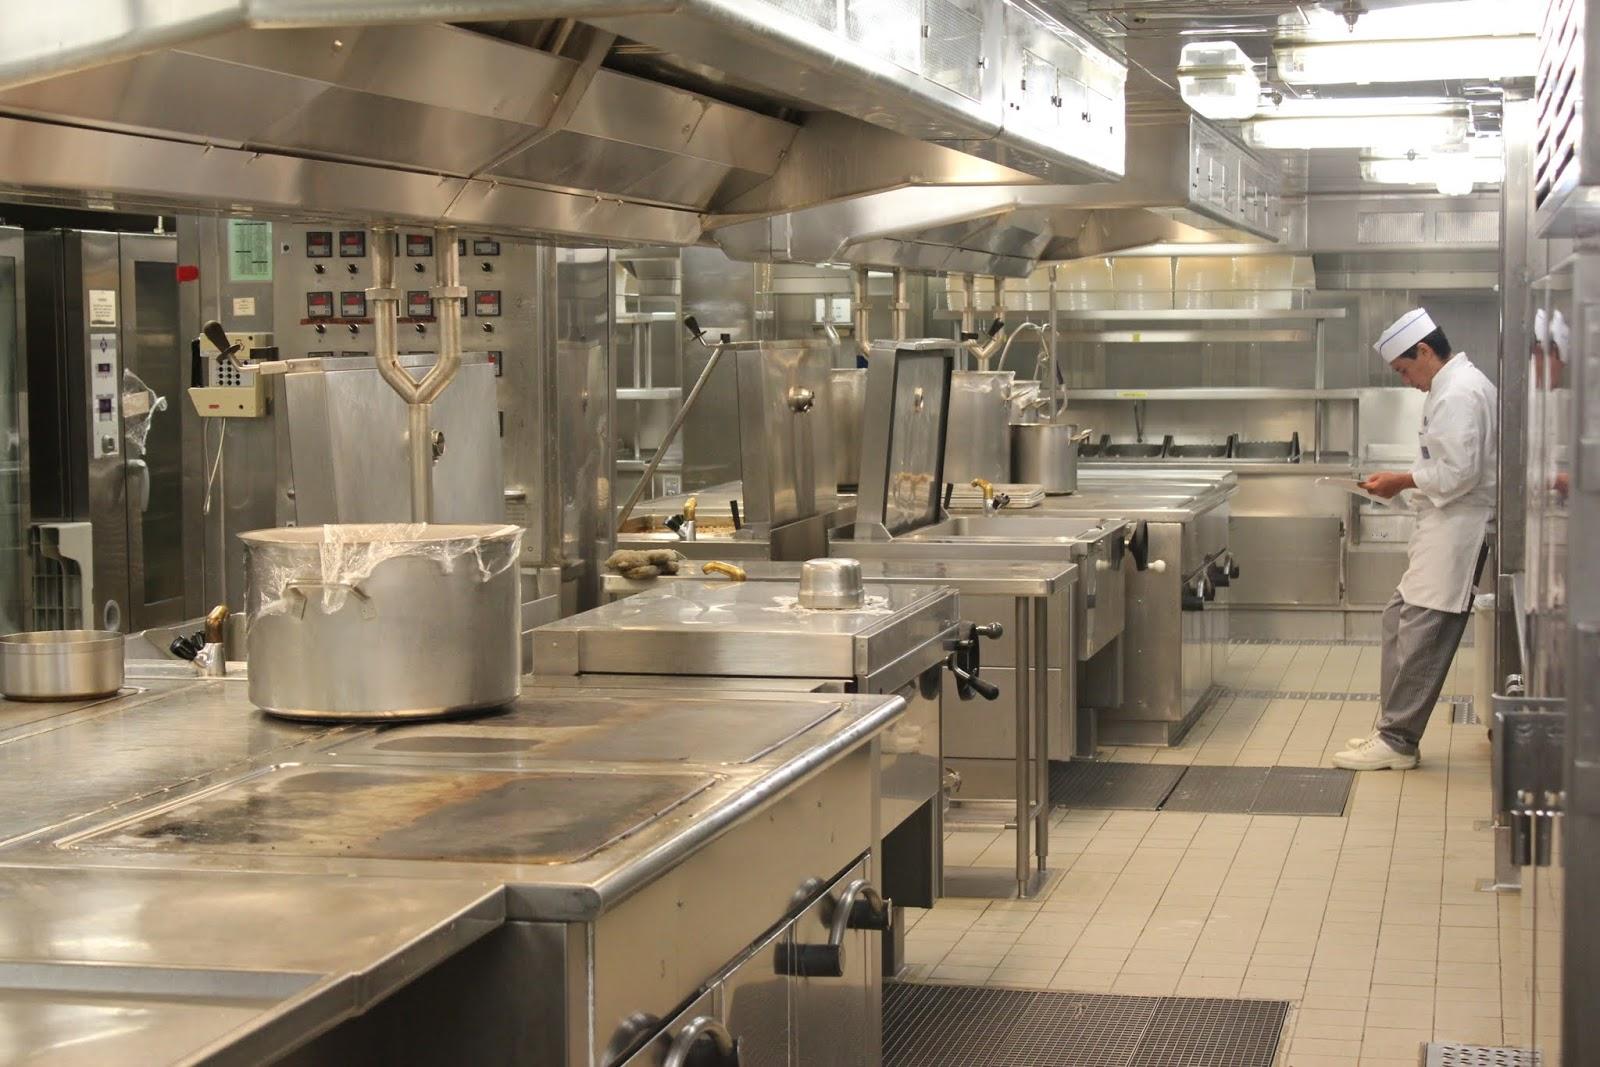 4 Bedroom Floor Plans Inside Buckingham Palace Kitchen Www Imgkid Com The